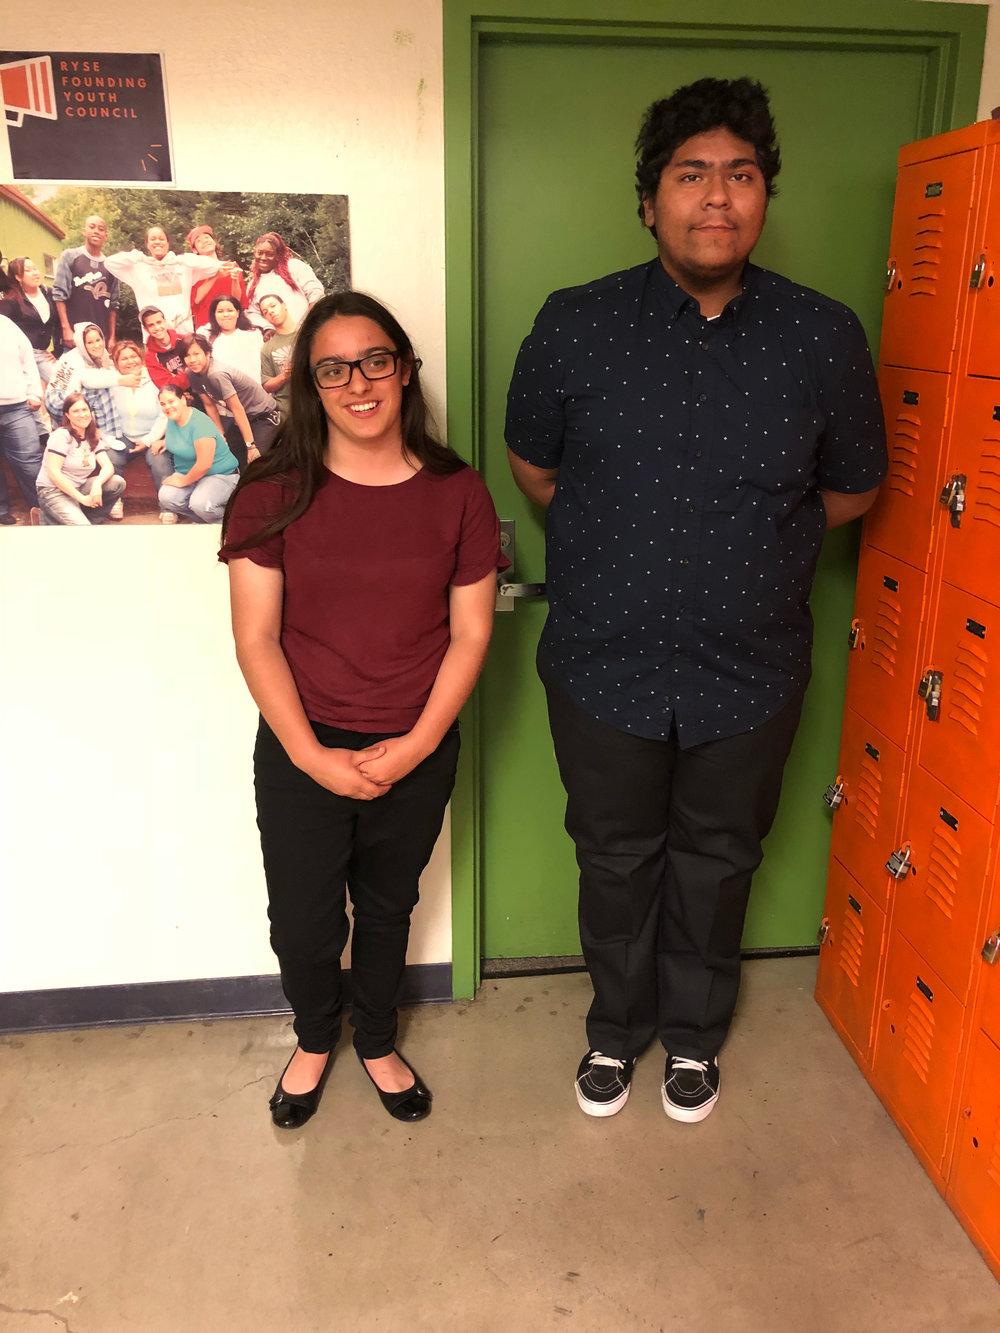 Congratulations Zari and Angel on their internships!